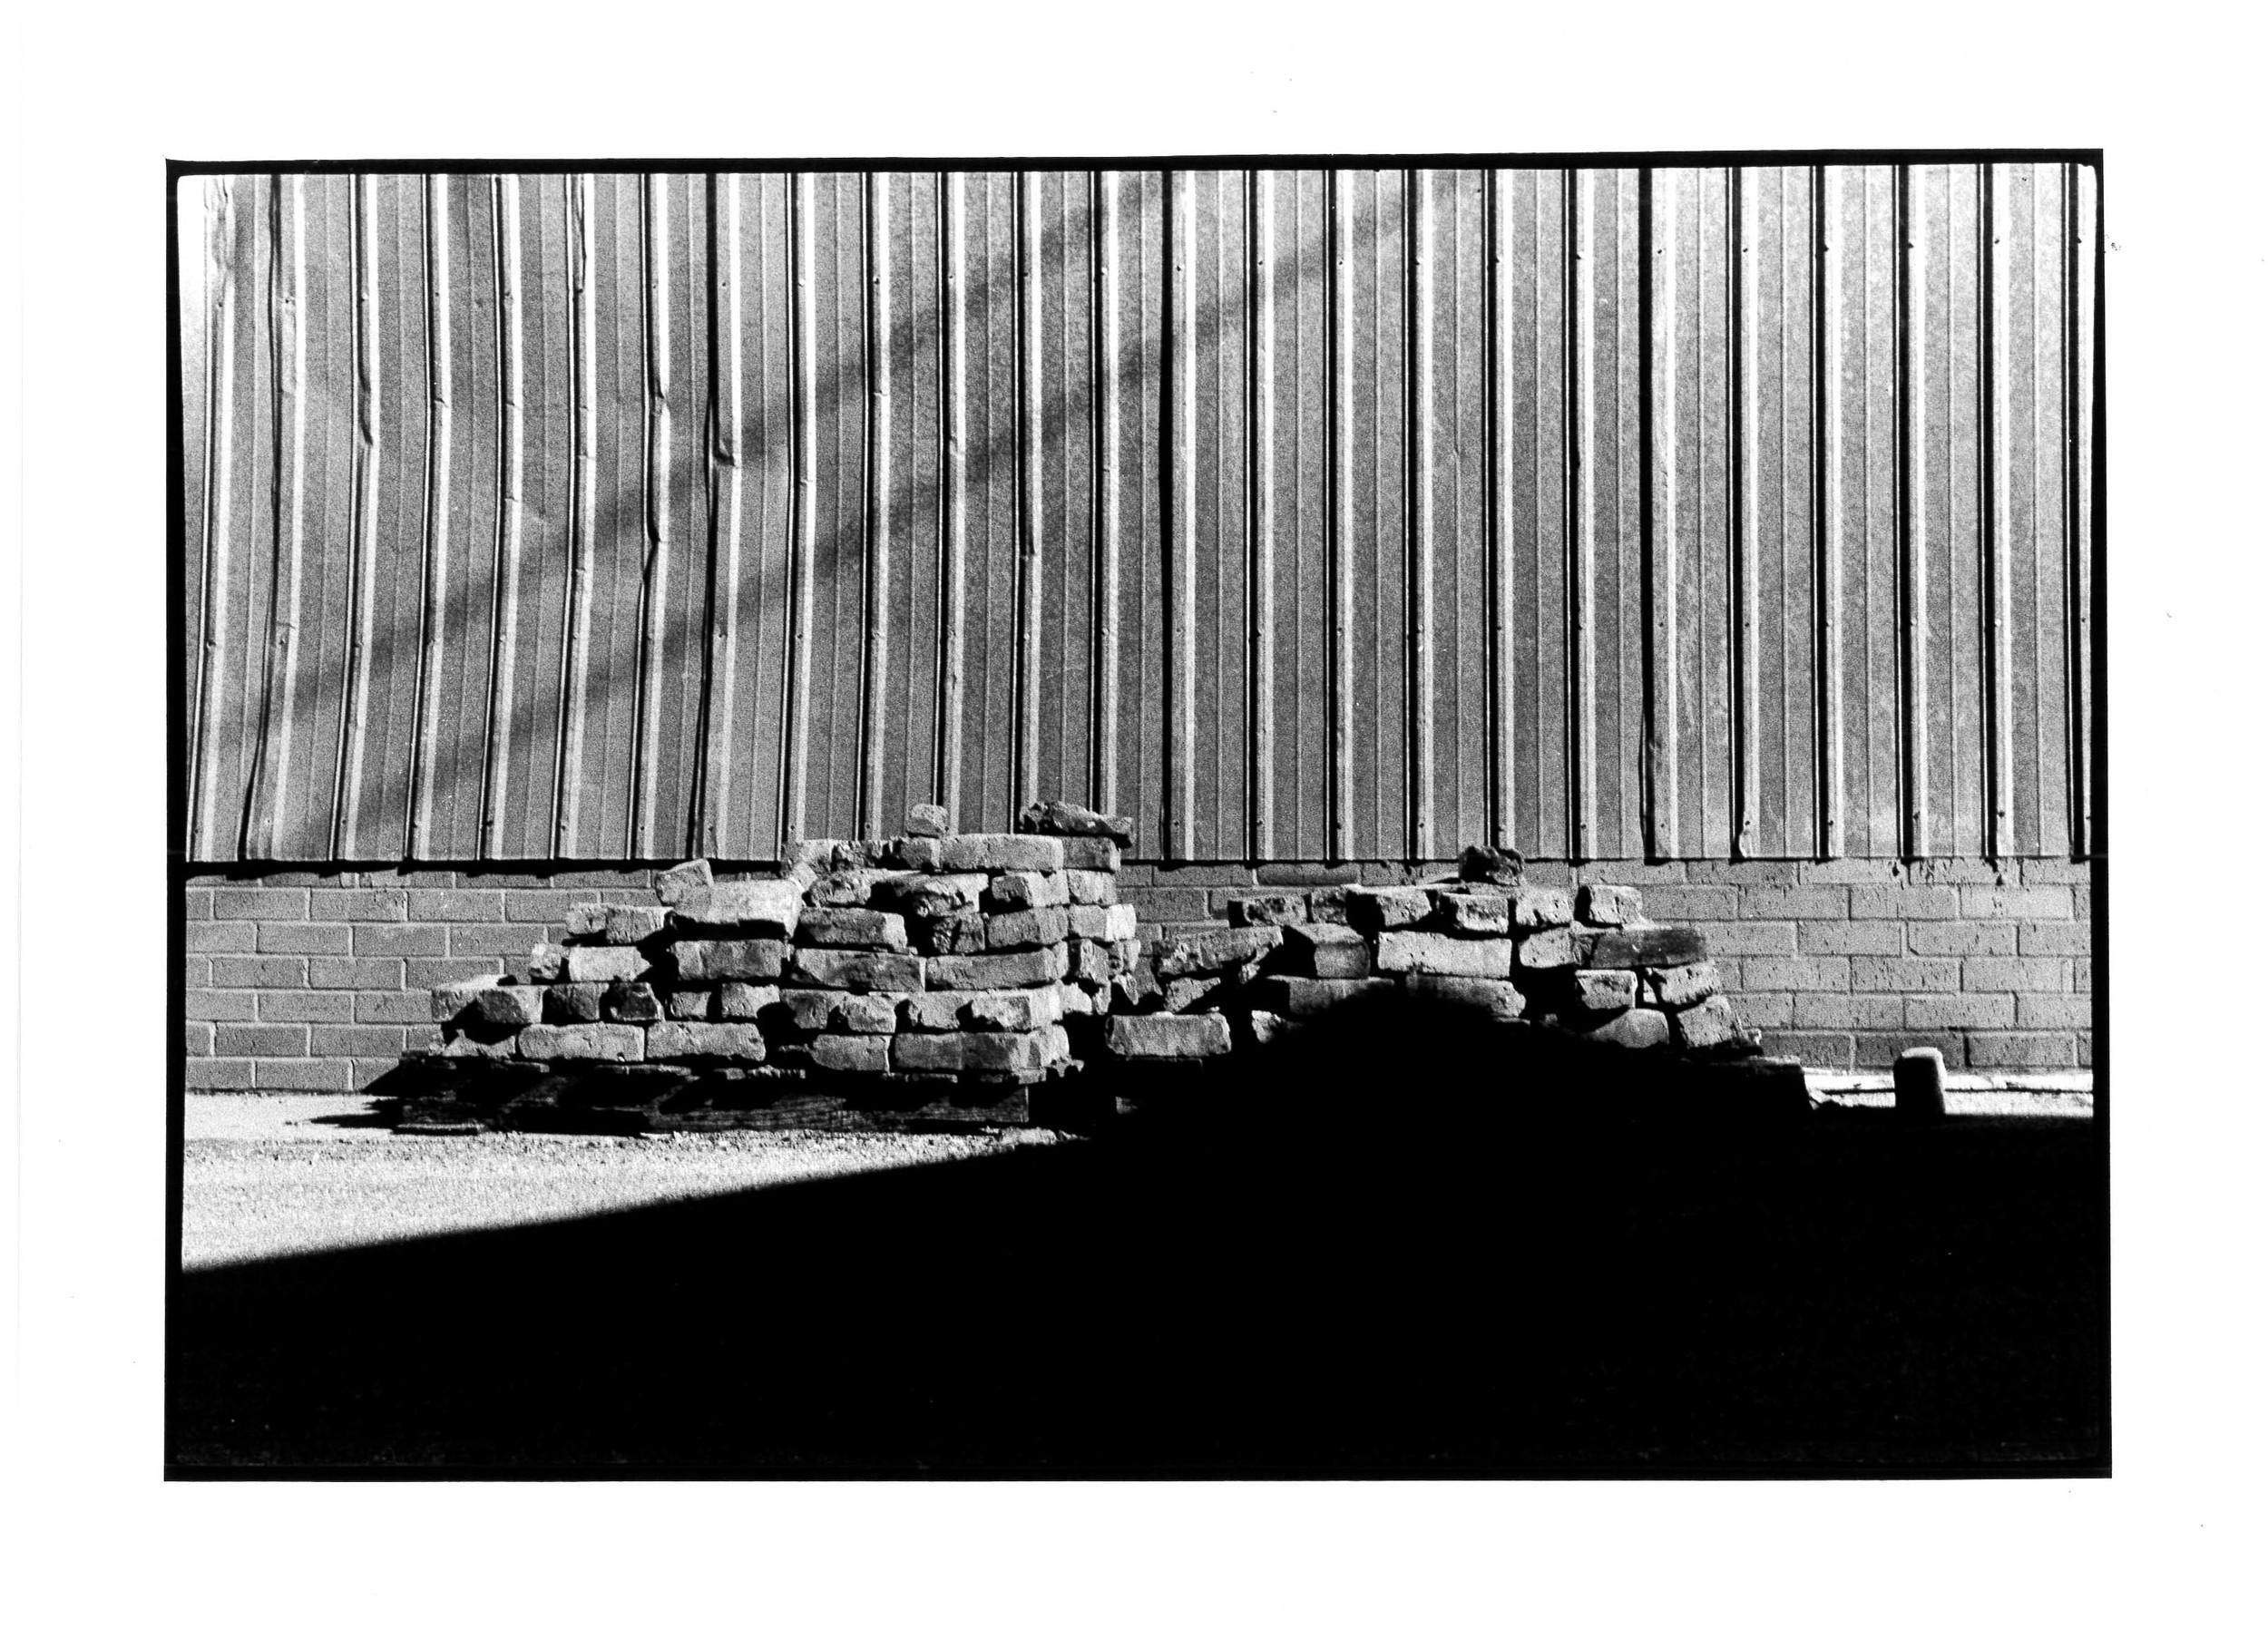 Bricks, Oklahoma 2011 24x36 cm